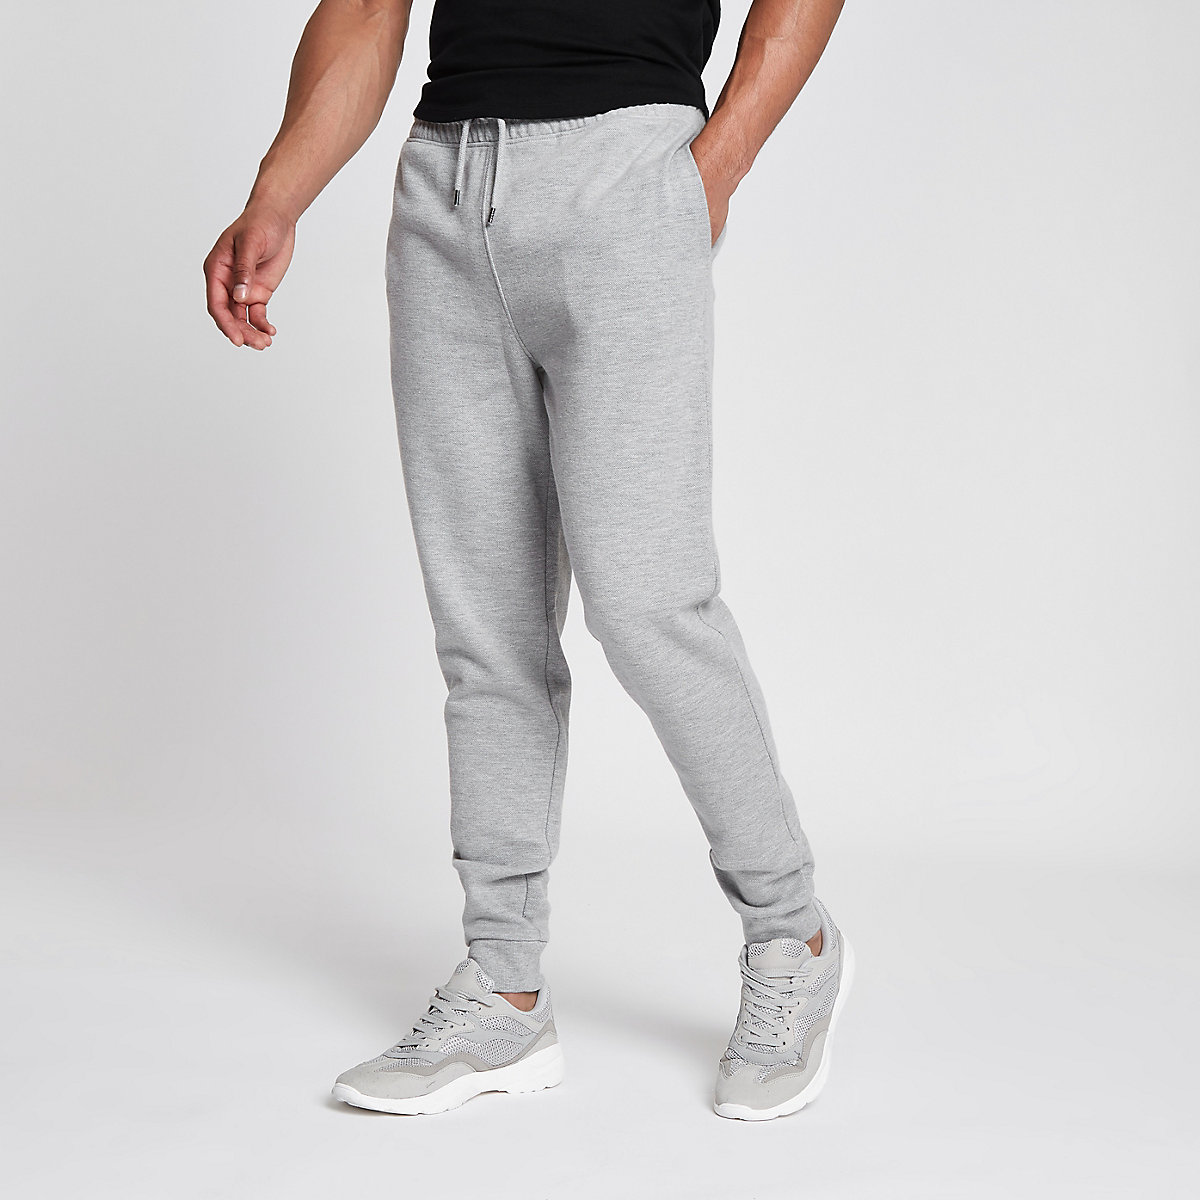 Grey marl slim fit pique jogger